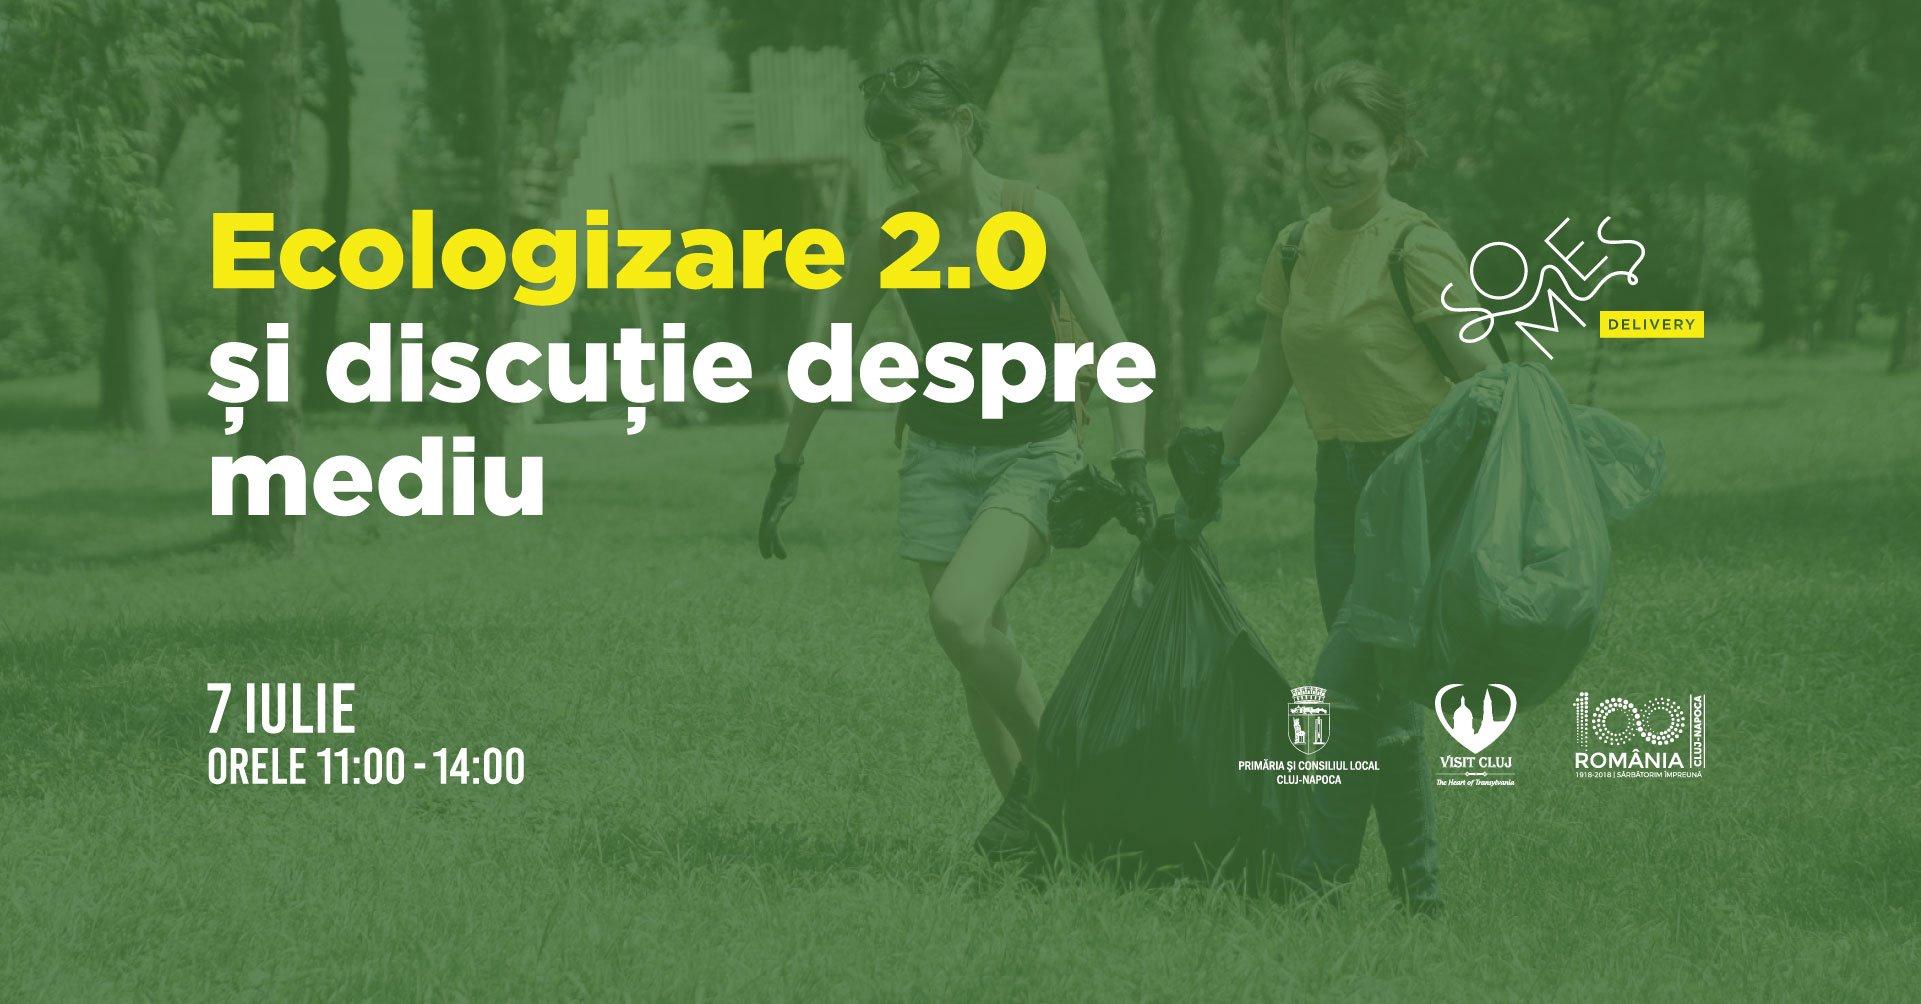 Ecologizare 2.0 și discuție despre mediu | Someș Delivery 2019